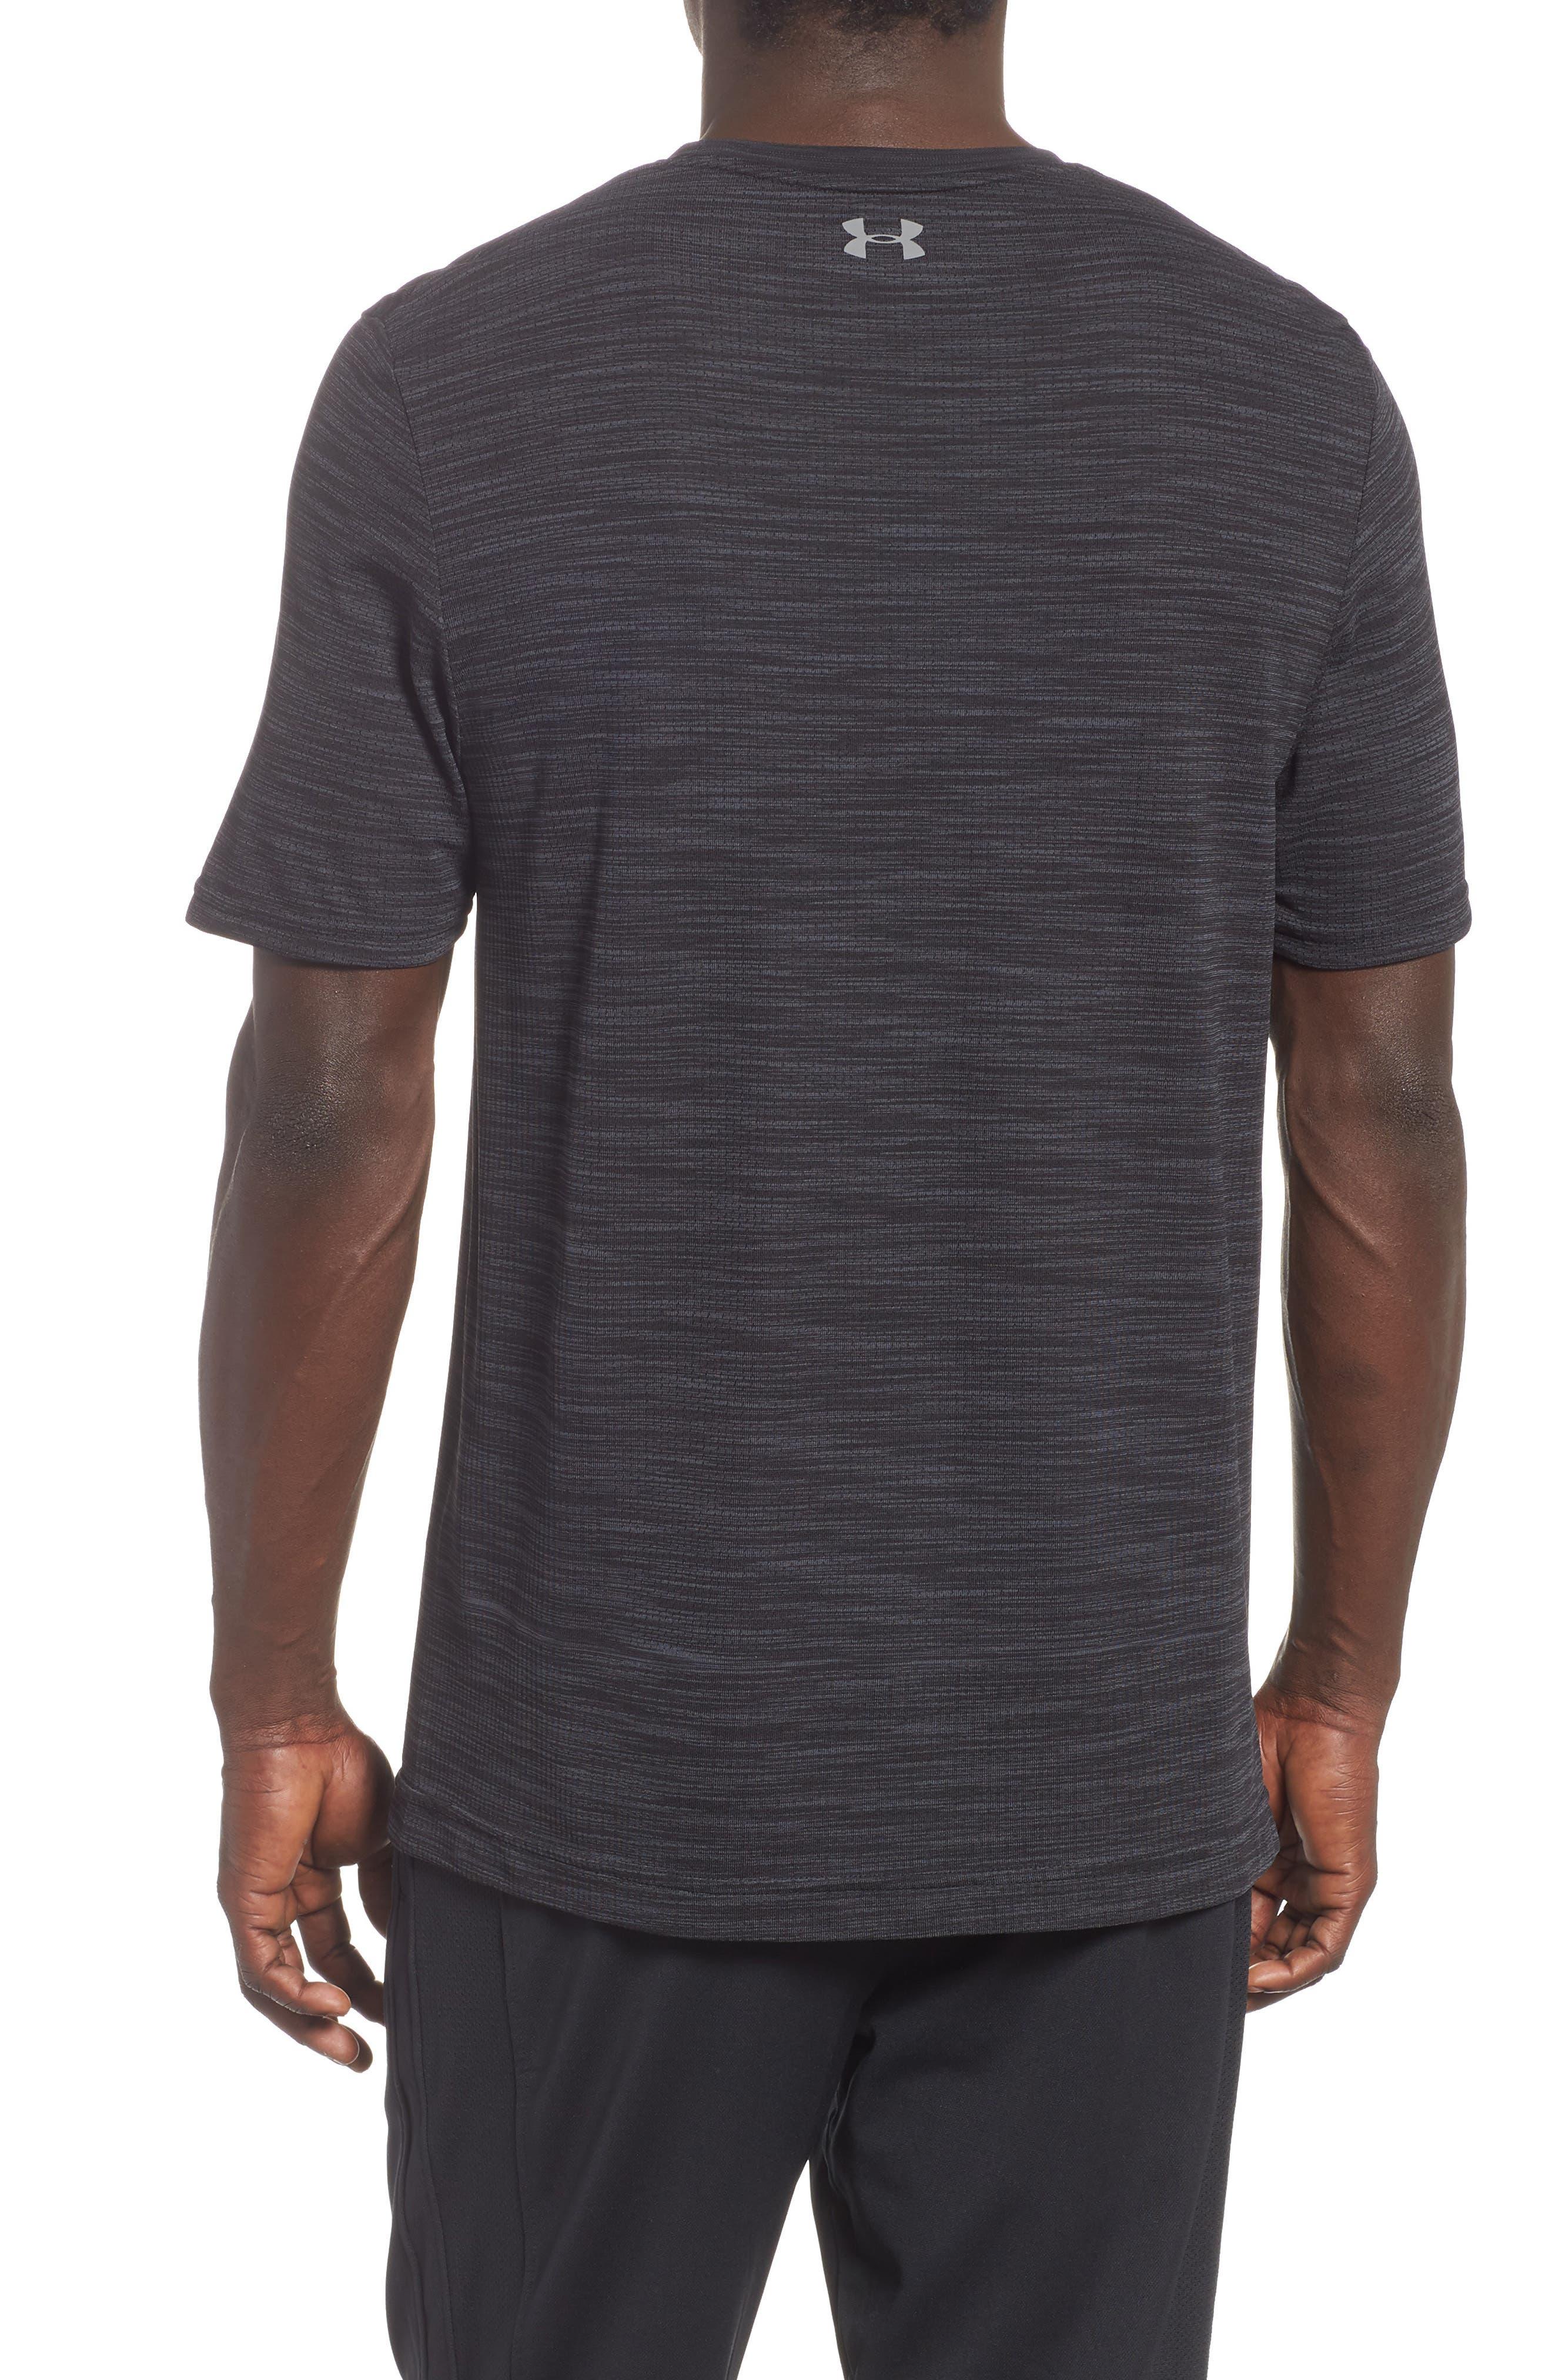 Siphon Performance T-Shirt,                             Alternate thumbnail 2, color,                             BLACK